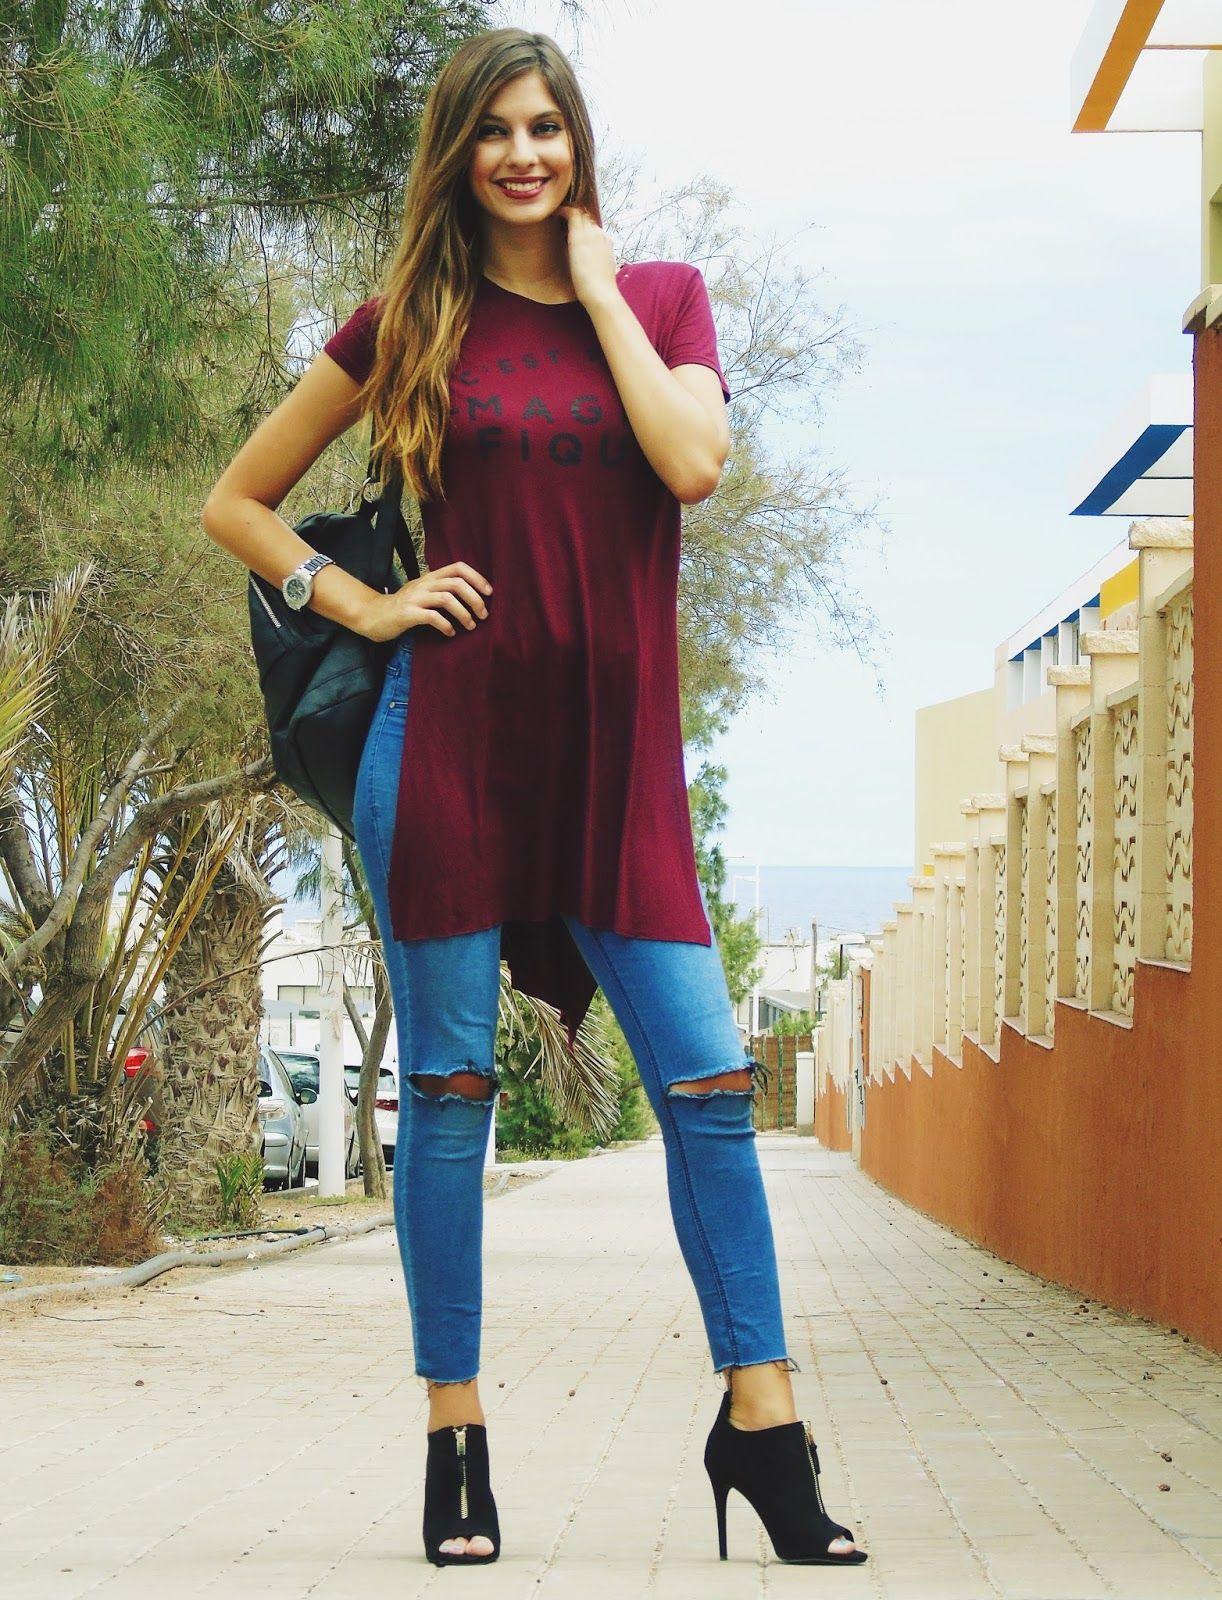 blusas largas outfit